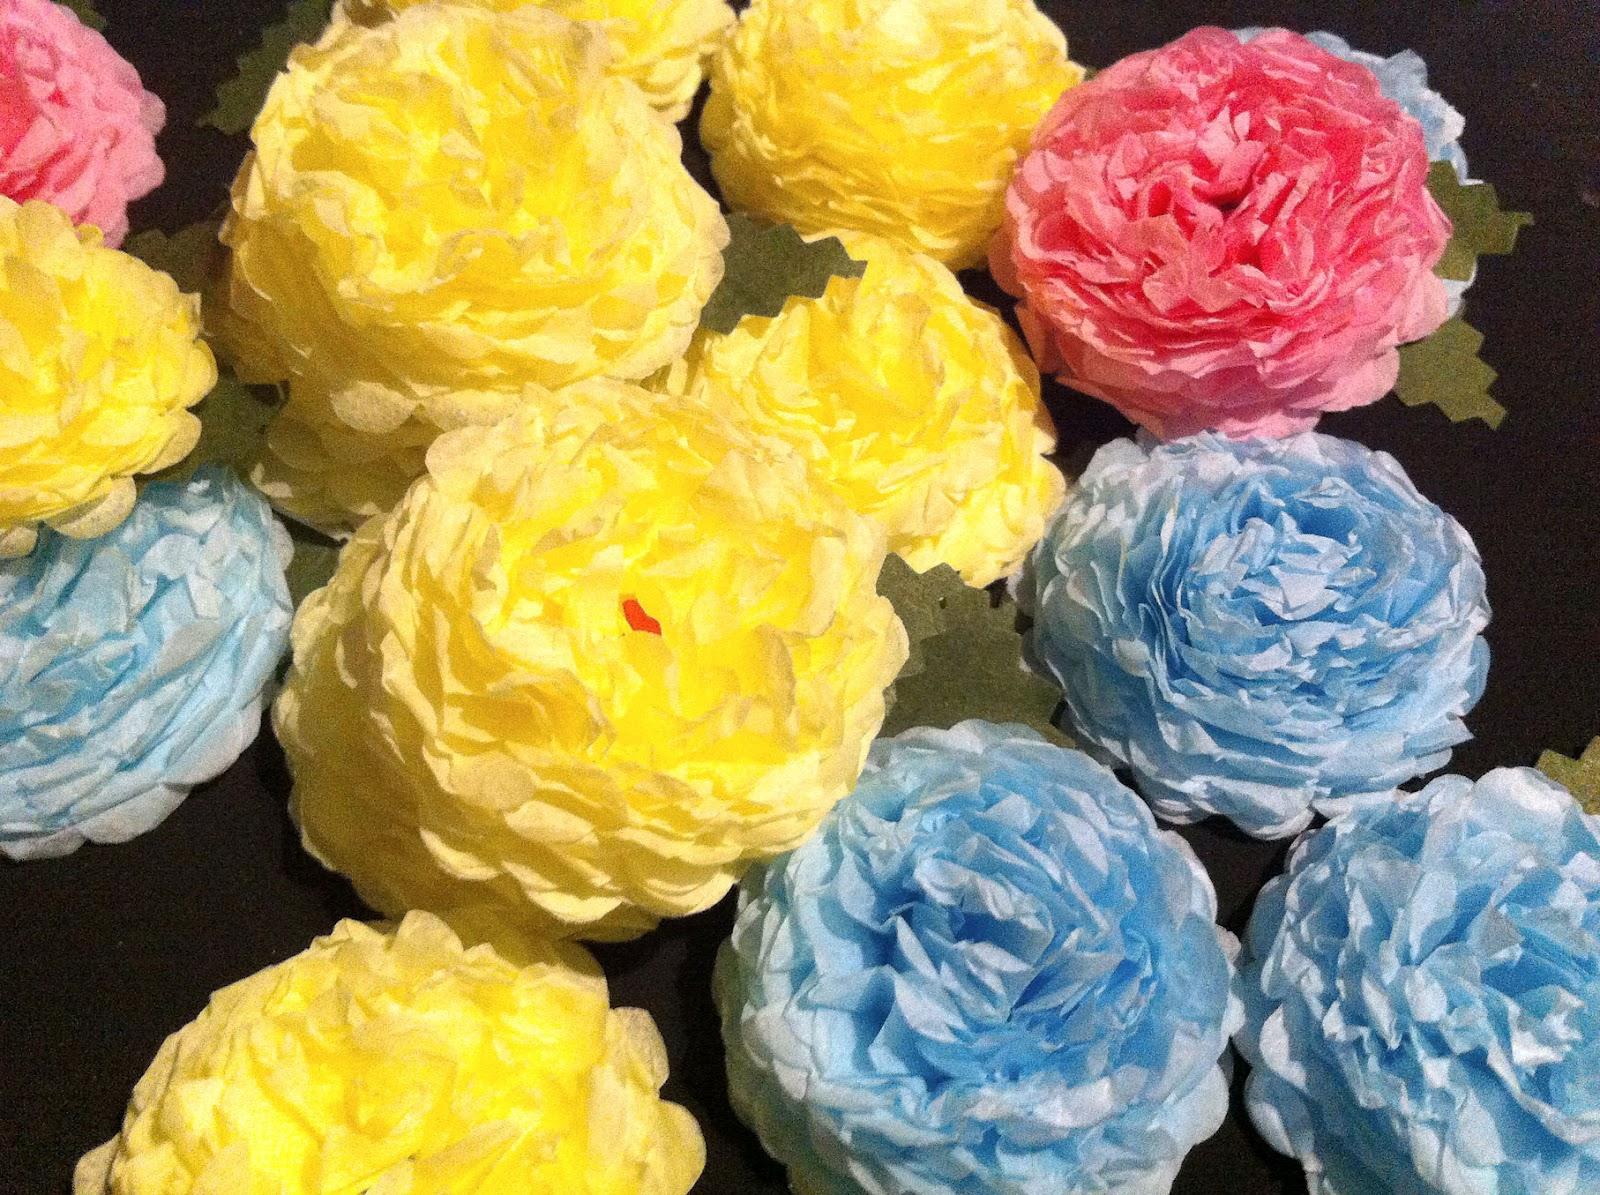 Sbartist Painting In The Dark Handmade Tissue Paper Flowers For